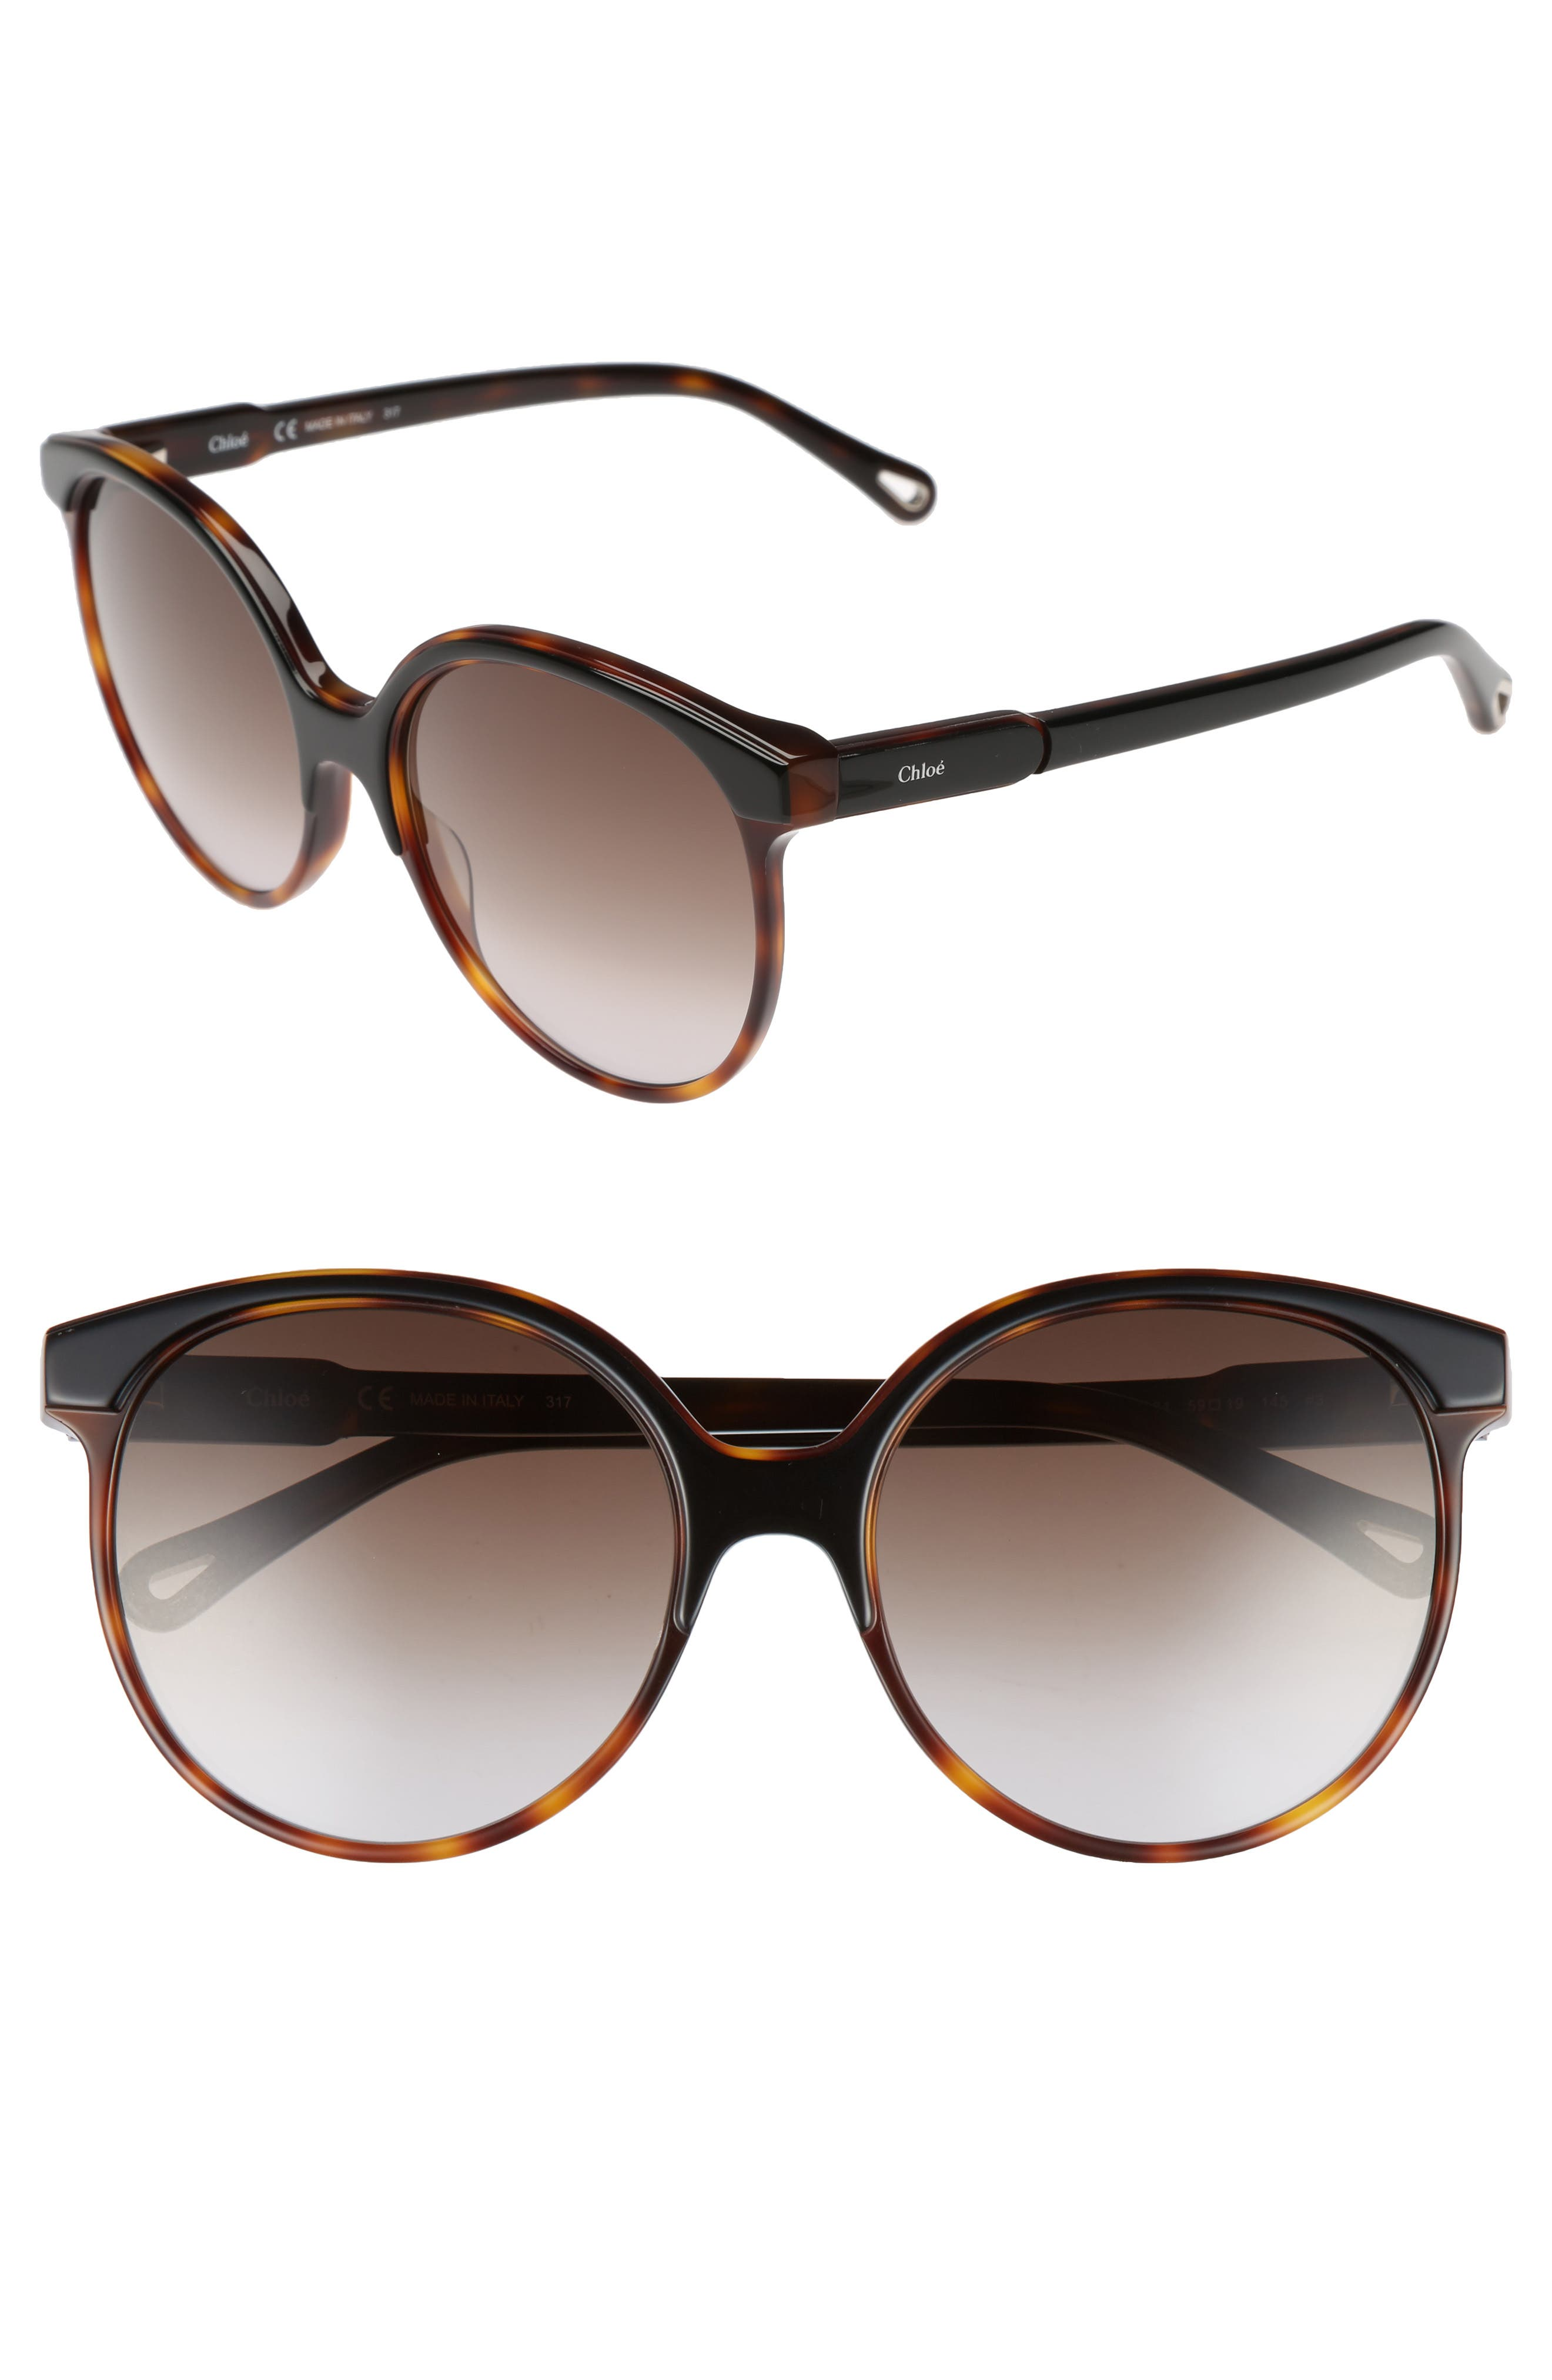 59mm Round Sunglasses,                             Main thumbnail 1, color,                             004